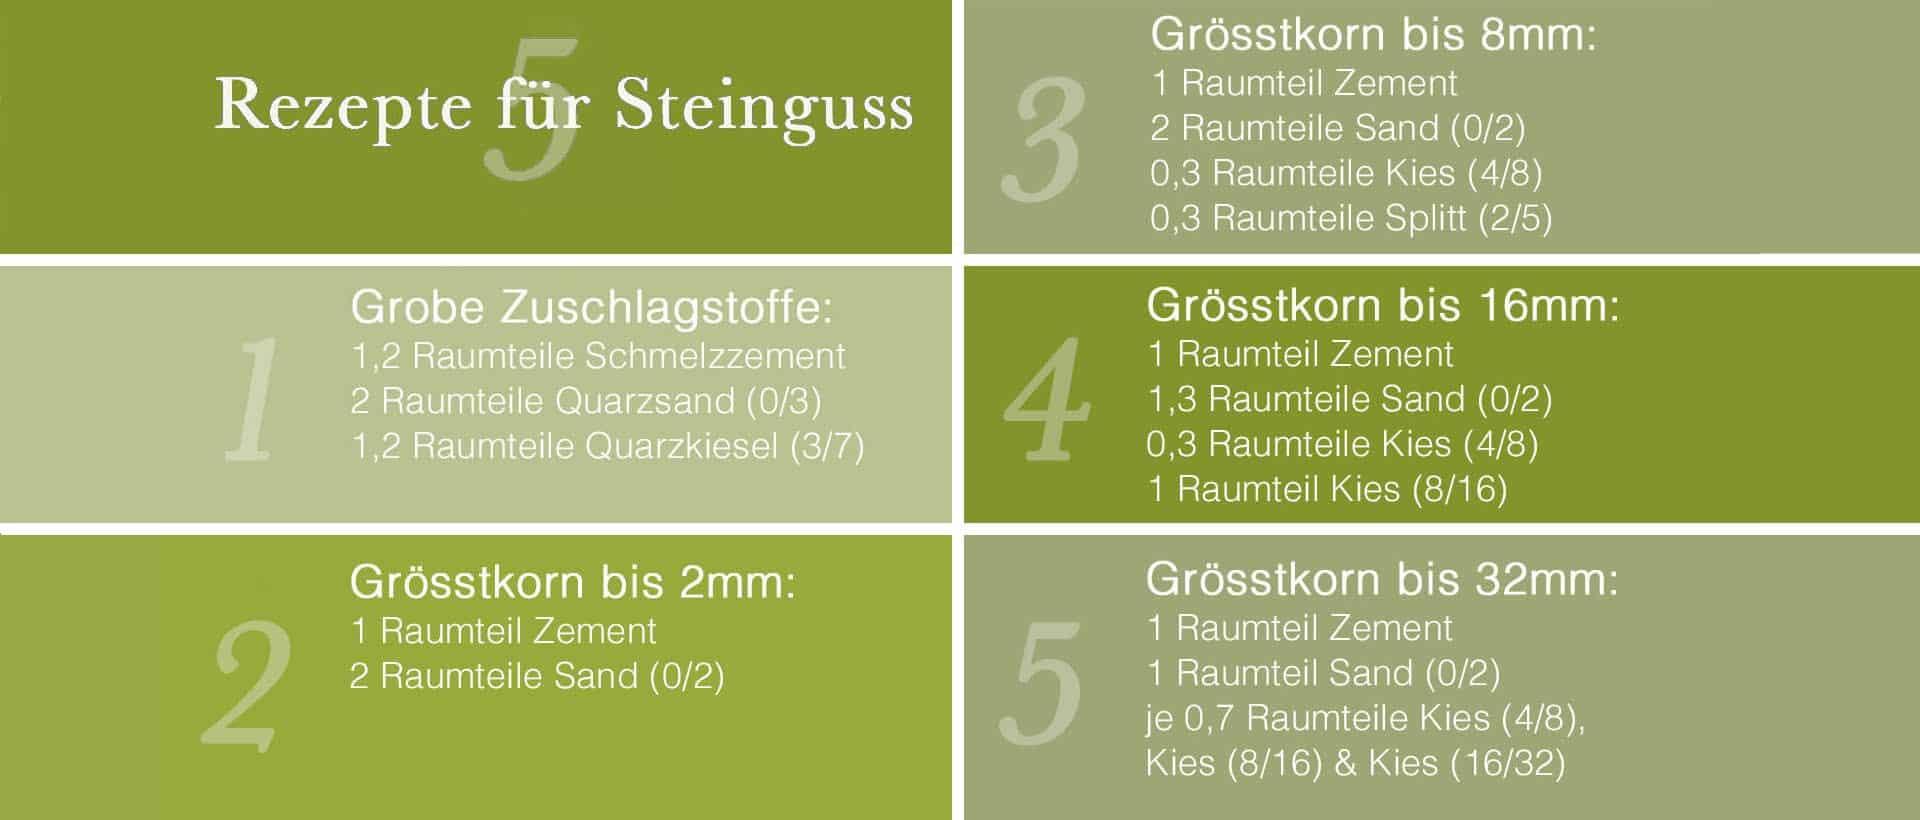 5-Rezepte-fuer-Steinguss-horizontal